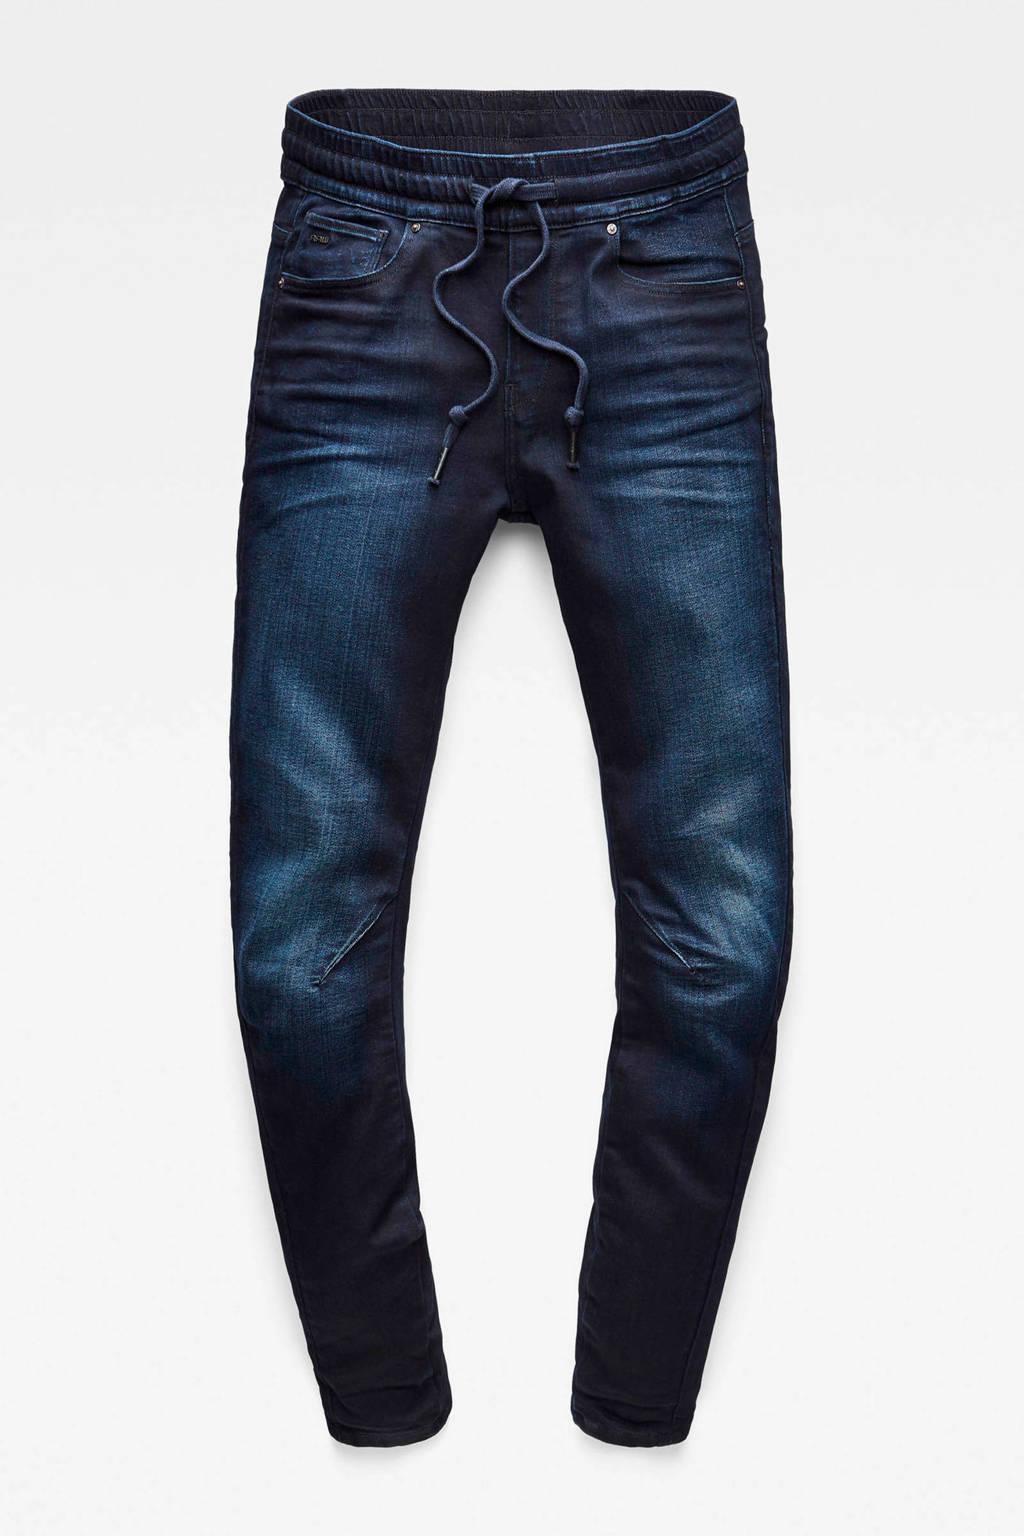 G-Star RAW boyfriend jeans, Blauw